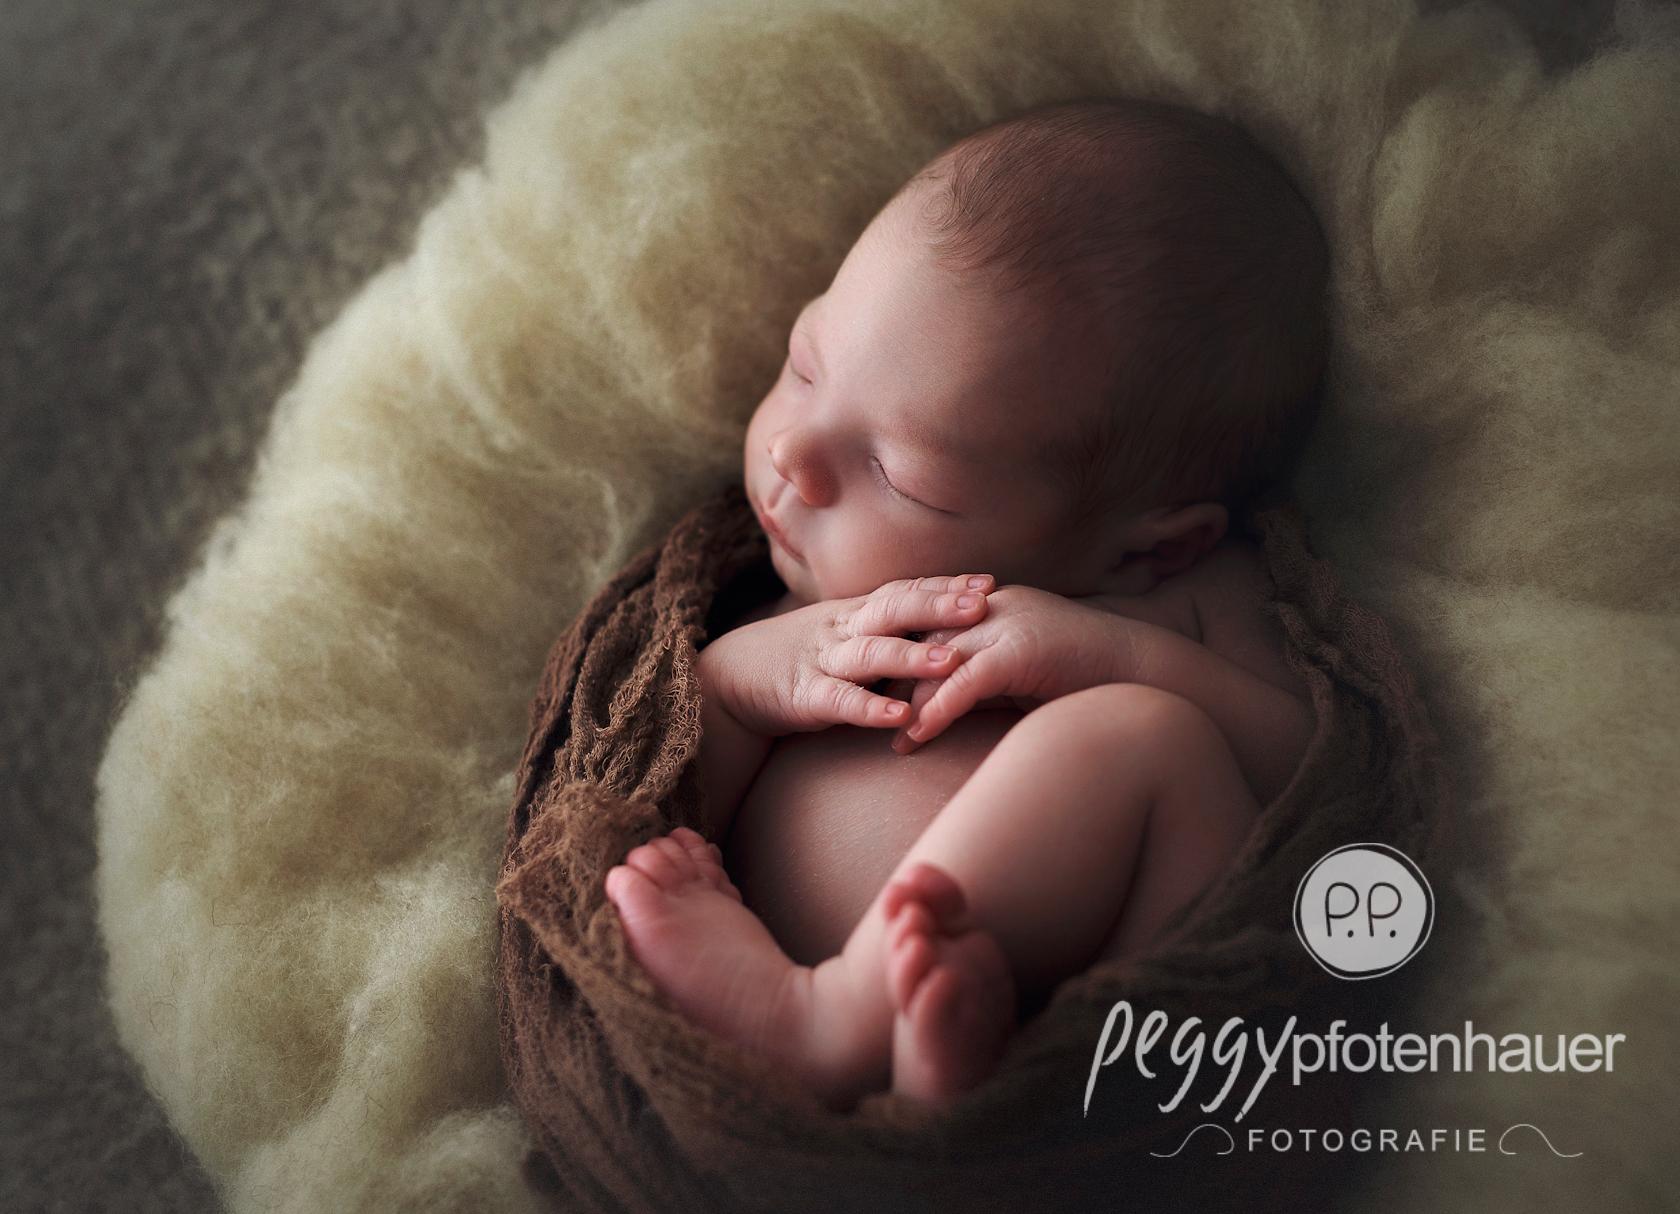 Babyfotos Bayreuth Peggy Pfotenhauer Fotografie